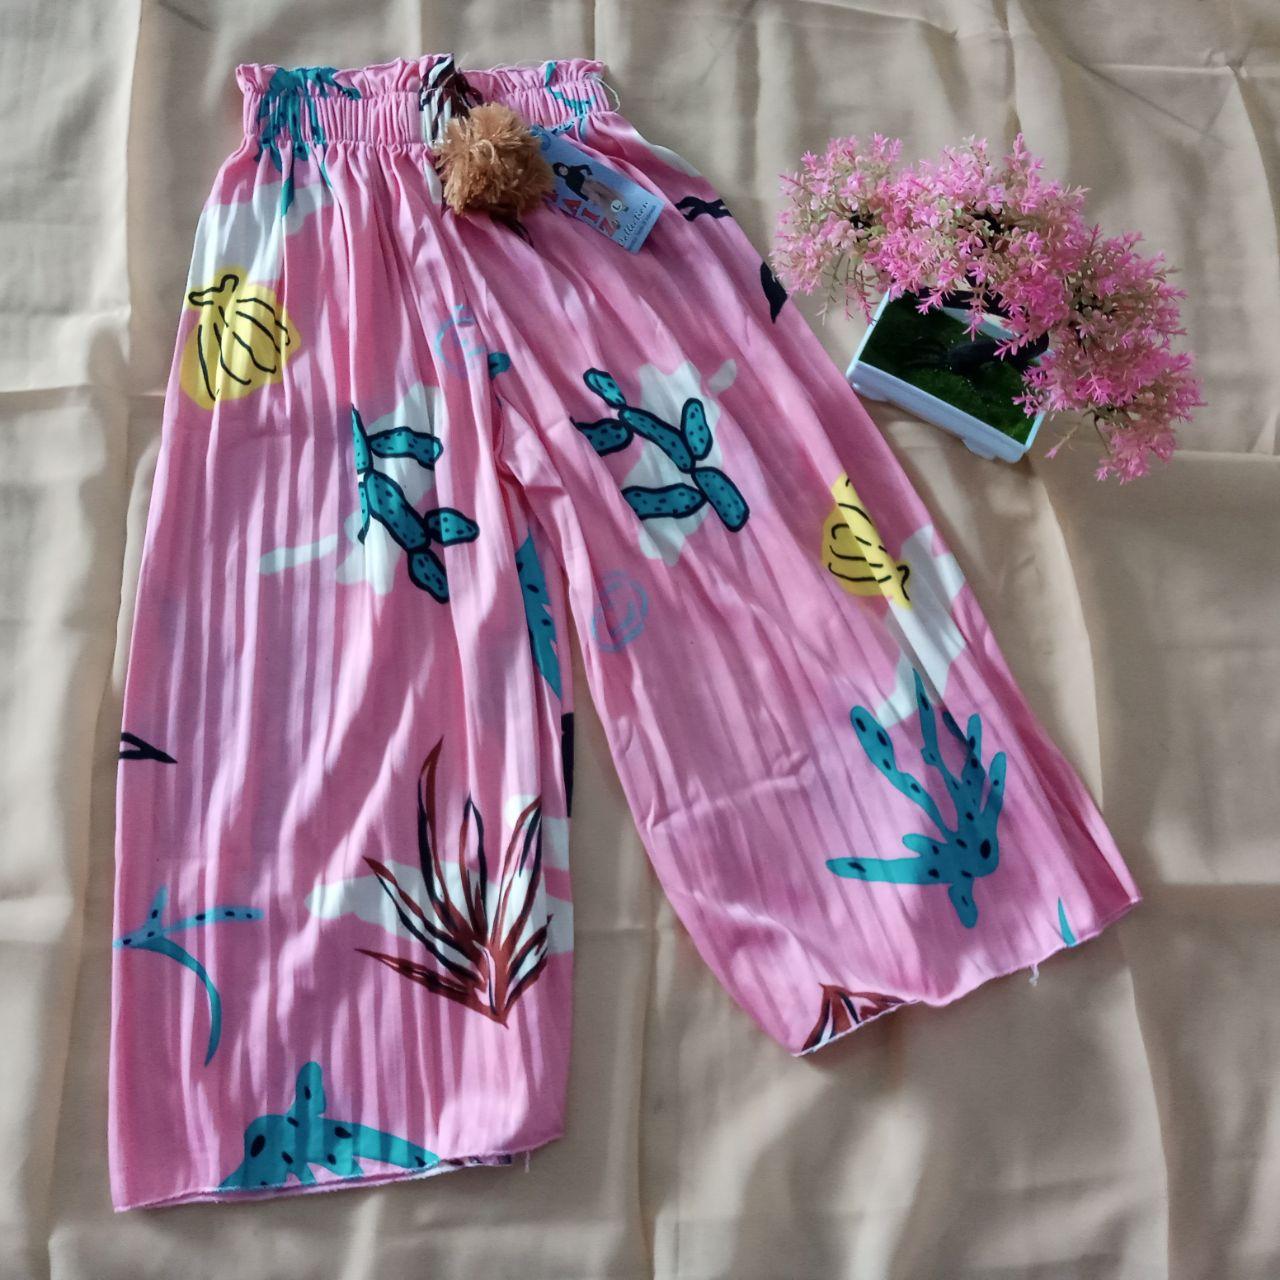 ini adalah Kulot Plisket Anak Motif Dusty Pink, size: Long 64 cm, material: Jersey, color: Pink, brand: BajuAnakindonesia, age_group: kids, gender: unisex